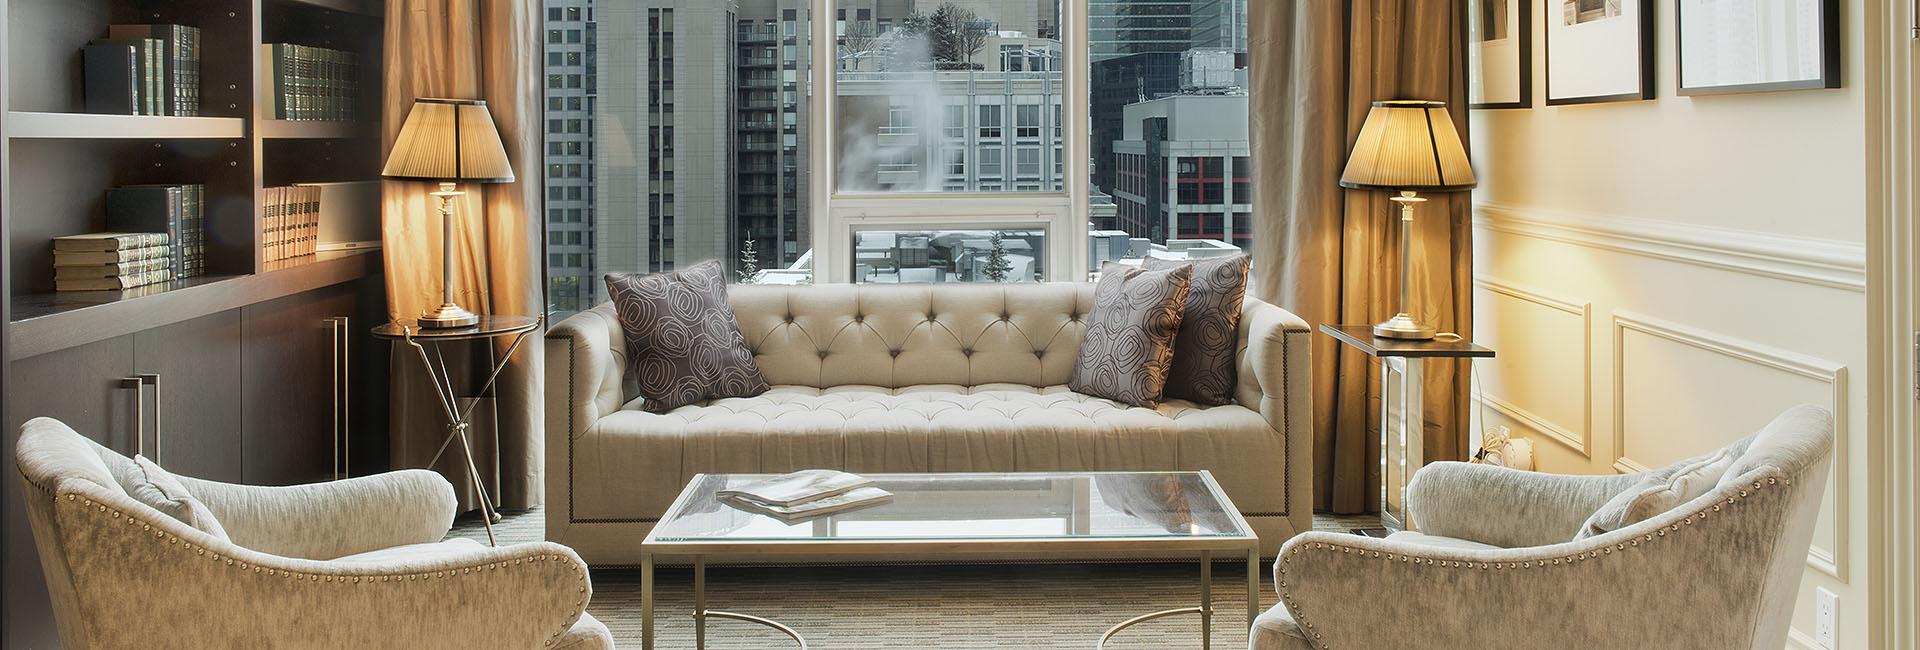 Penthouse Suite, Presidential Suite: SoHo Metropolitan Hotel   Toronto  Luxury Hotel, Toronto Boutique Hotel In Downtown Toronto